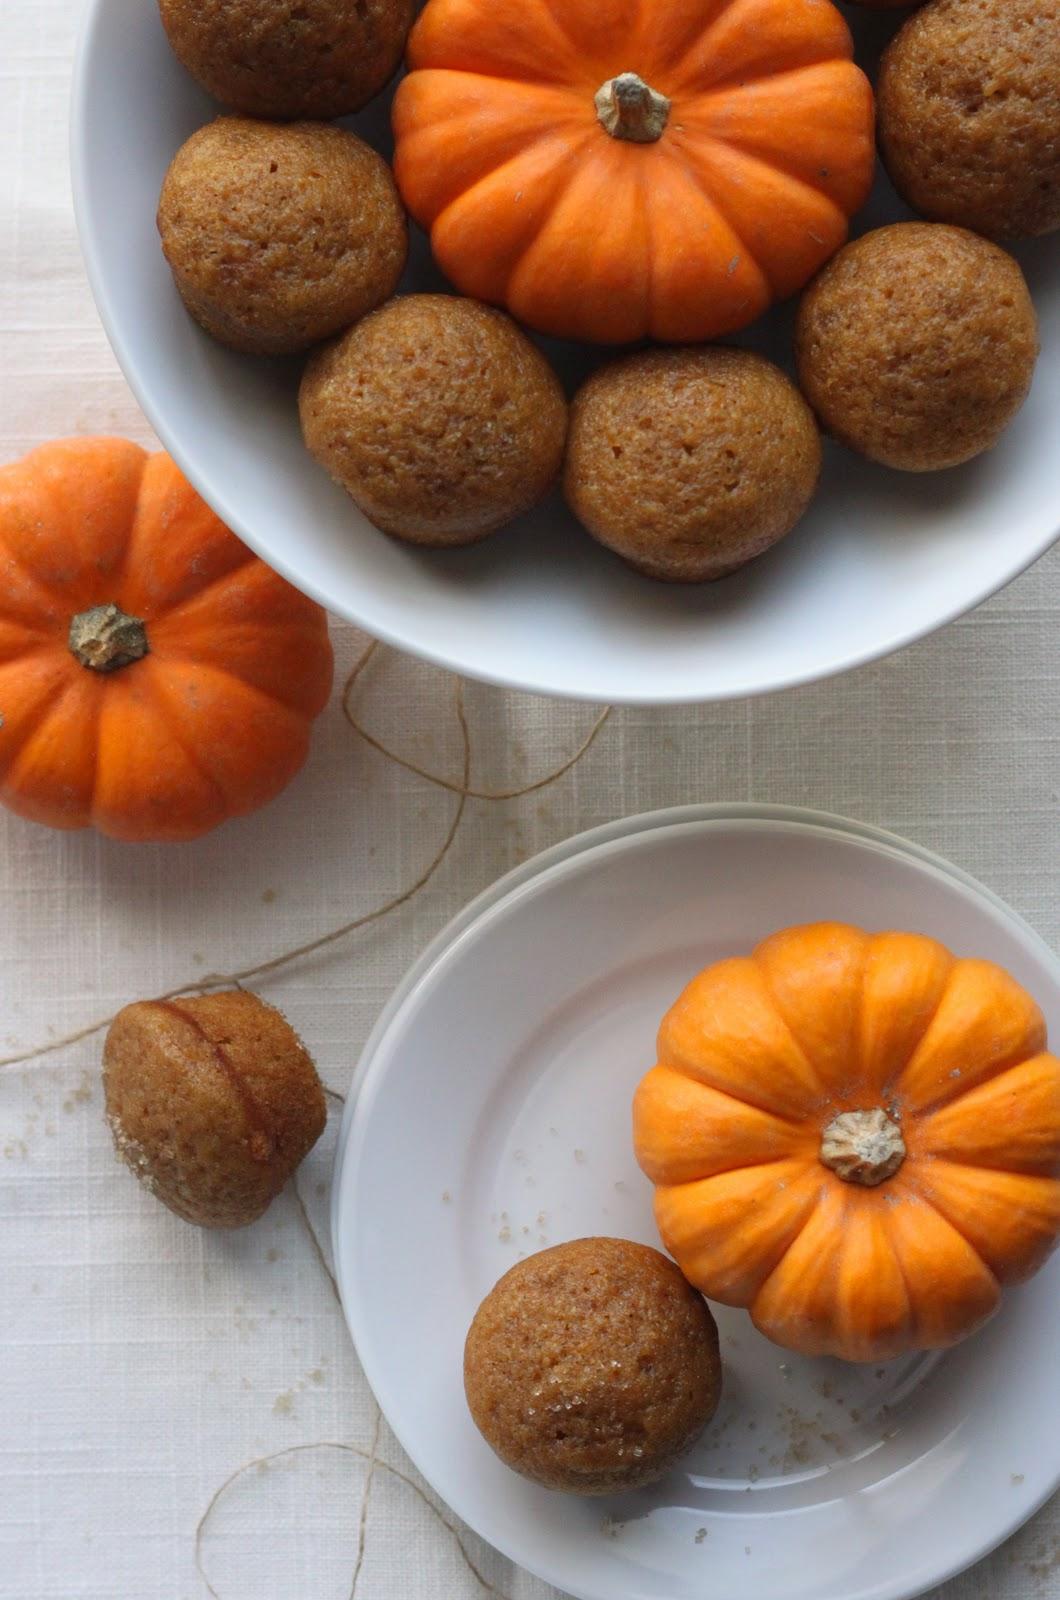 ... Pumpkin Bread, and Rum Raisin Pumpkin Bread Pudding (with Butter Rum